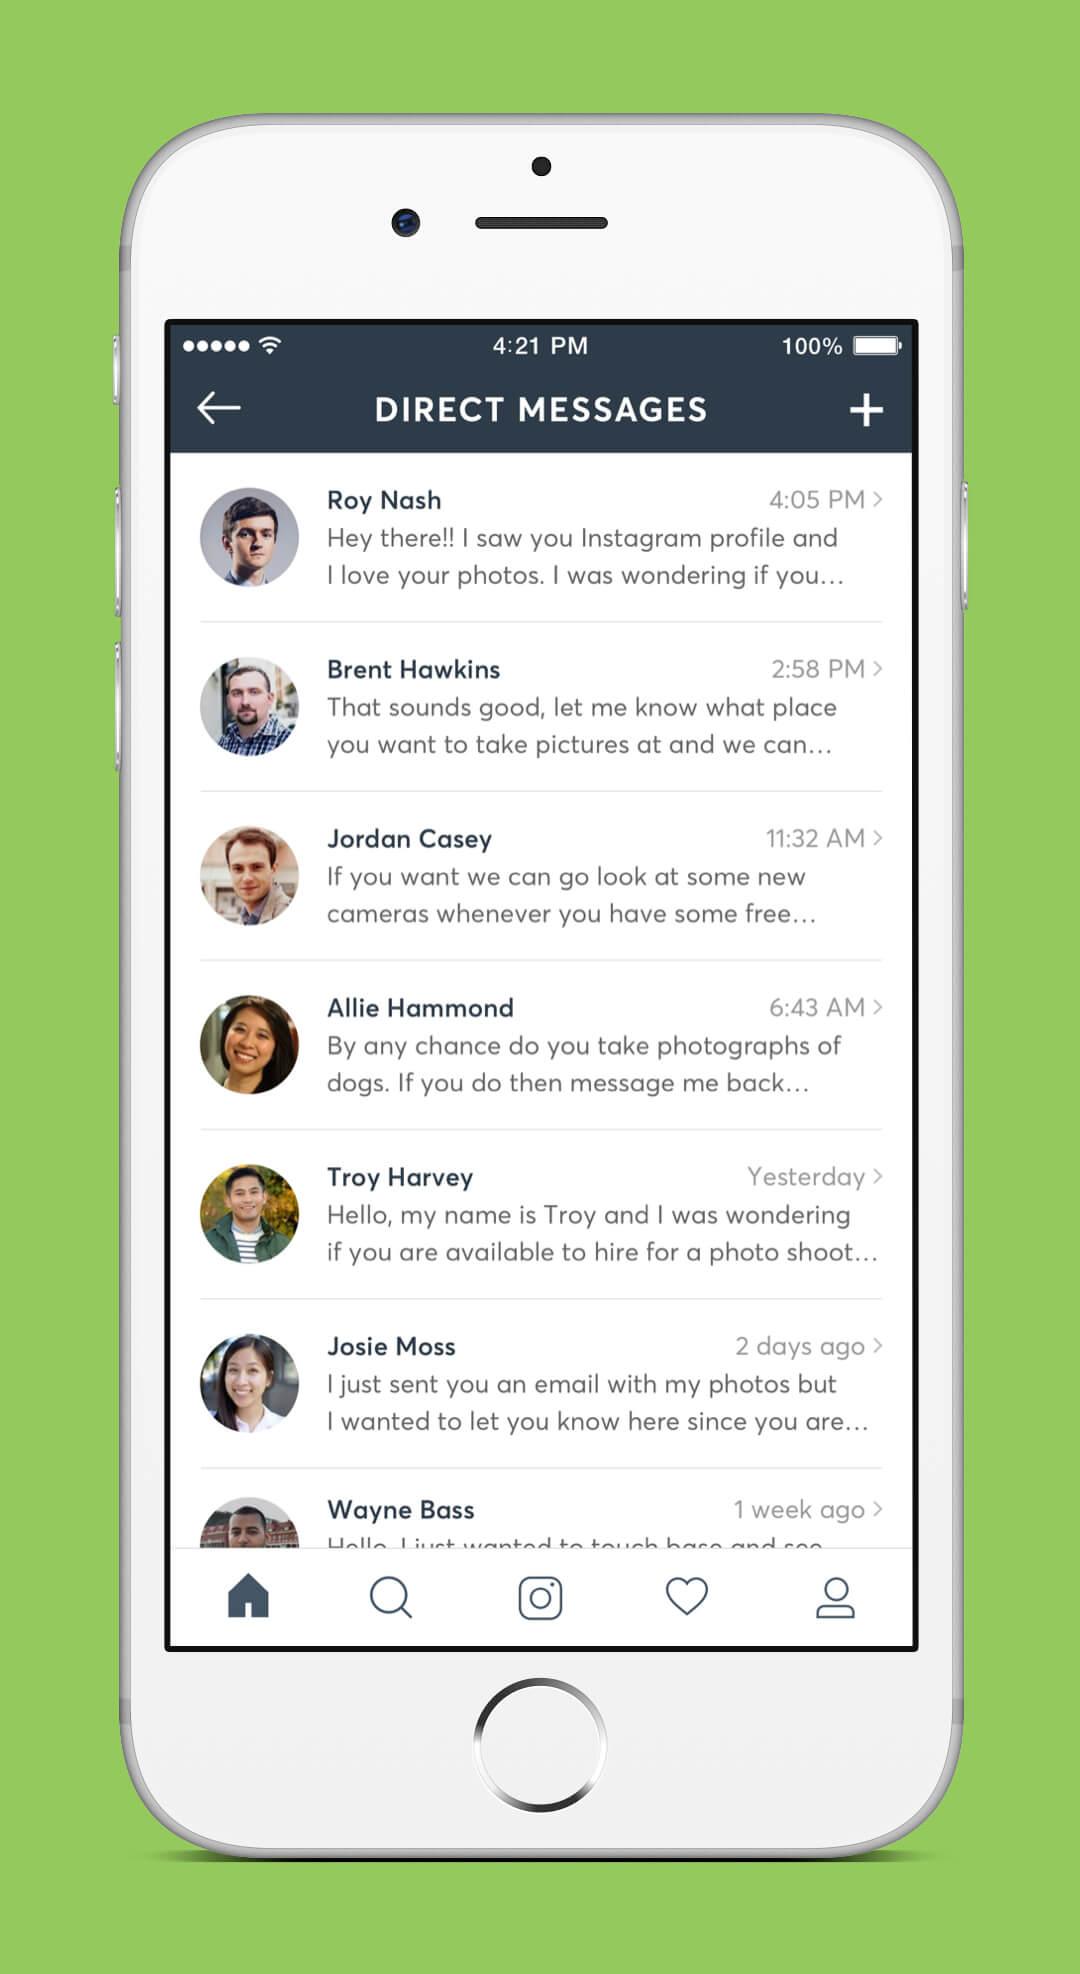 Instagram Redesign - Direct Messages Screen